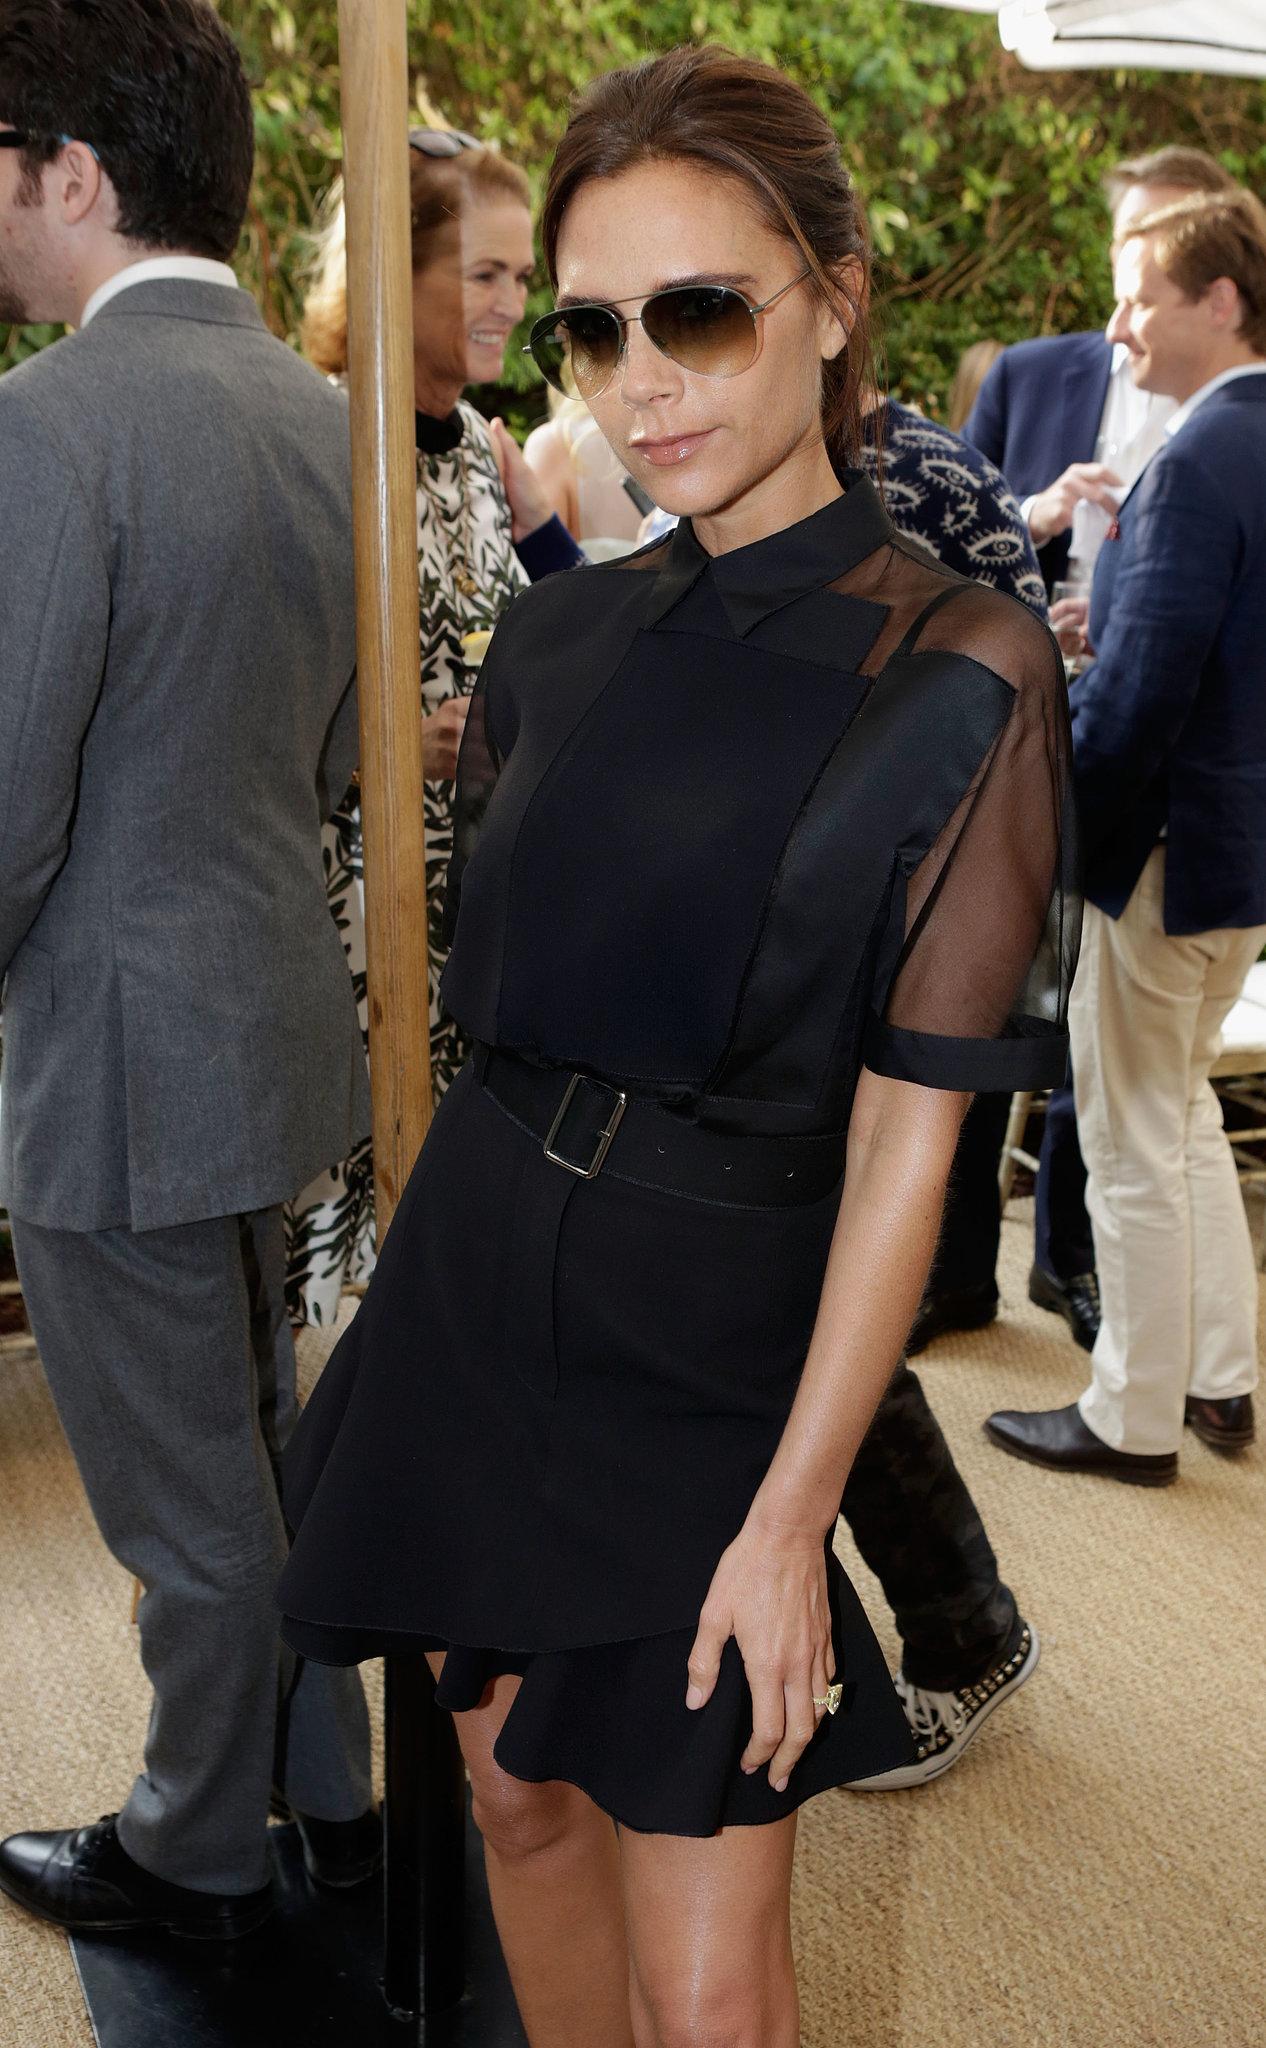 Victoria Beckham's Sunglasses Collection